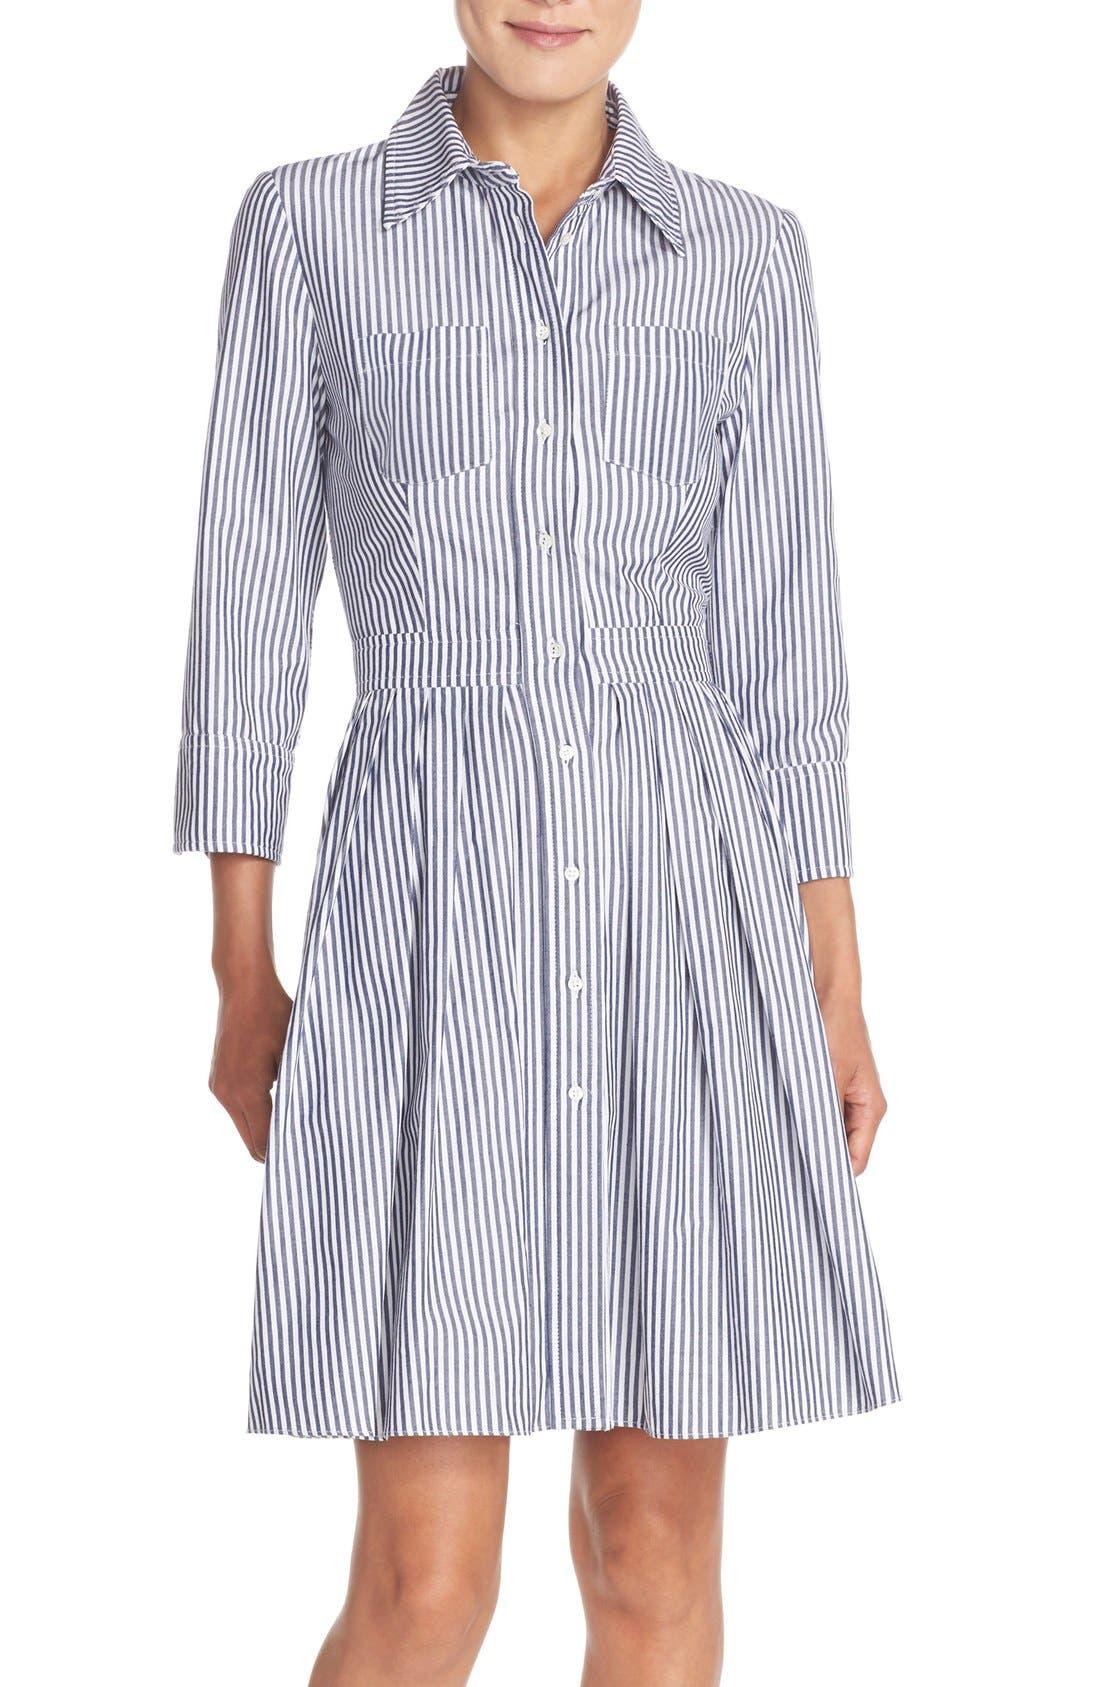 Stripe Cotton Shirtdress,                             Main thumbnail 1, color,                             421